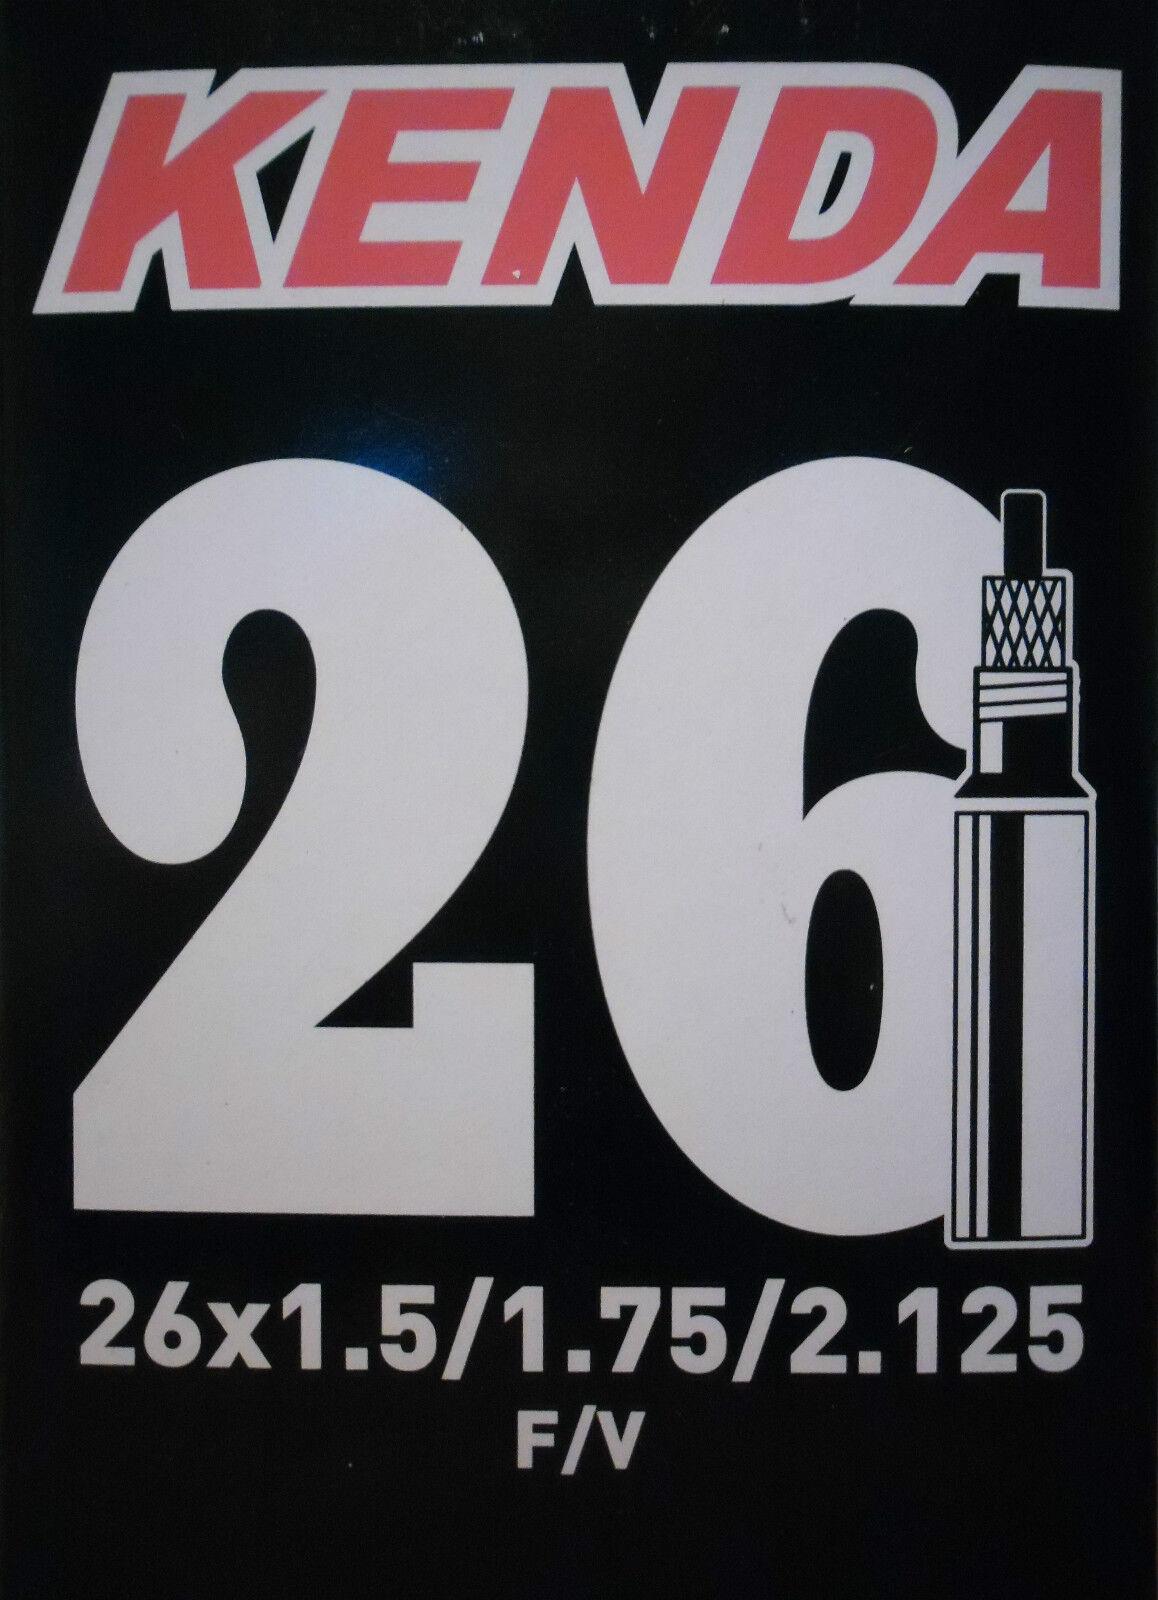 Kenda Chambre à à à air de vélo Presta Valve 26 X 1.5/1.75/2.125 Vélo Cyclisme eb4e25